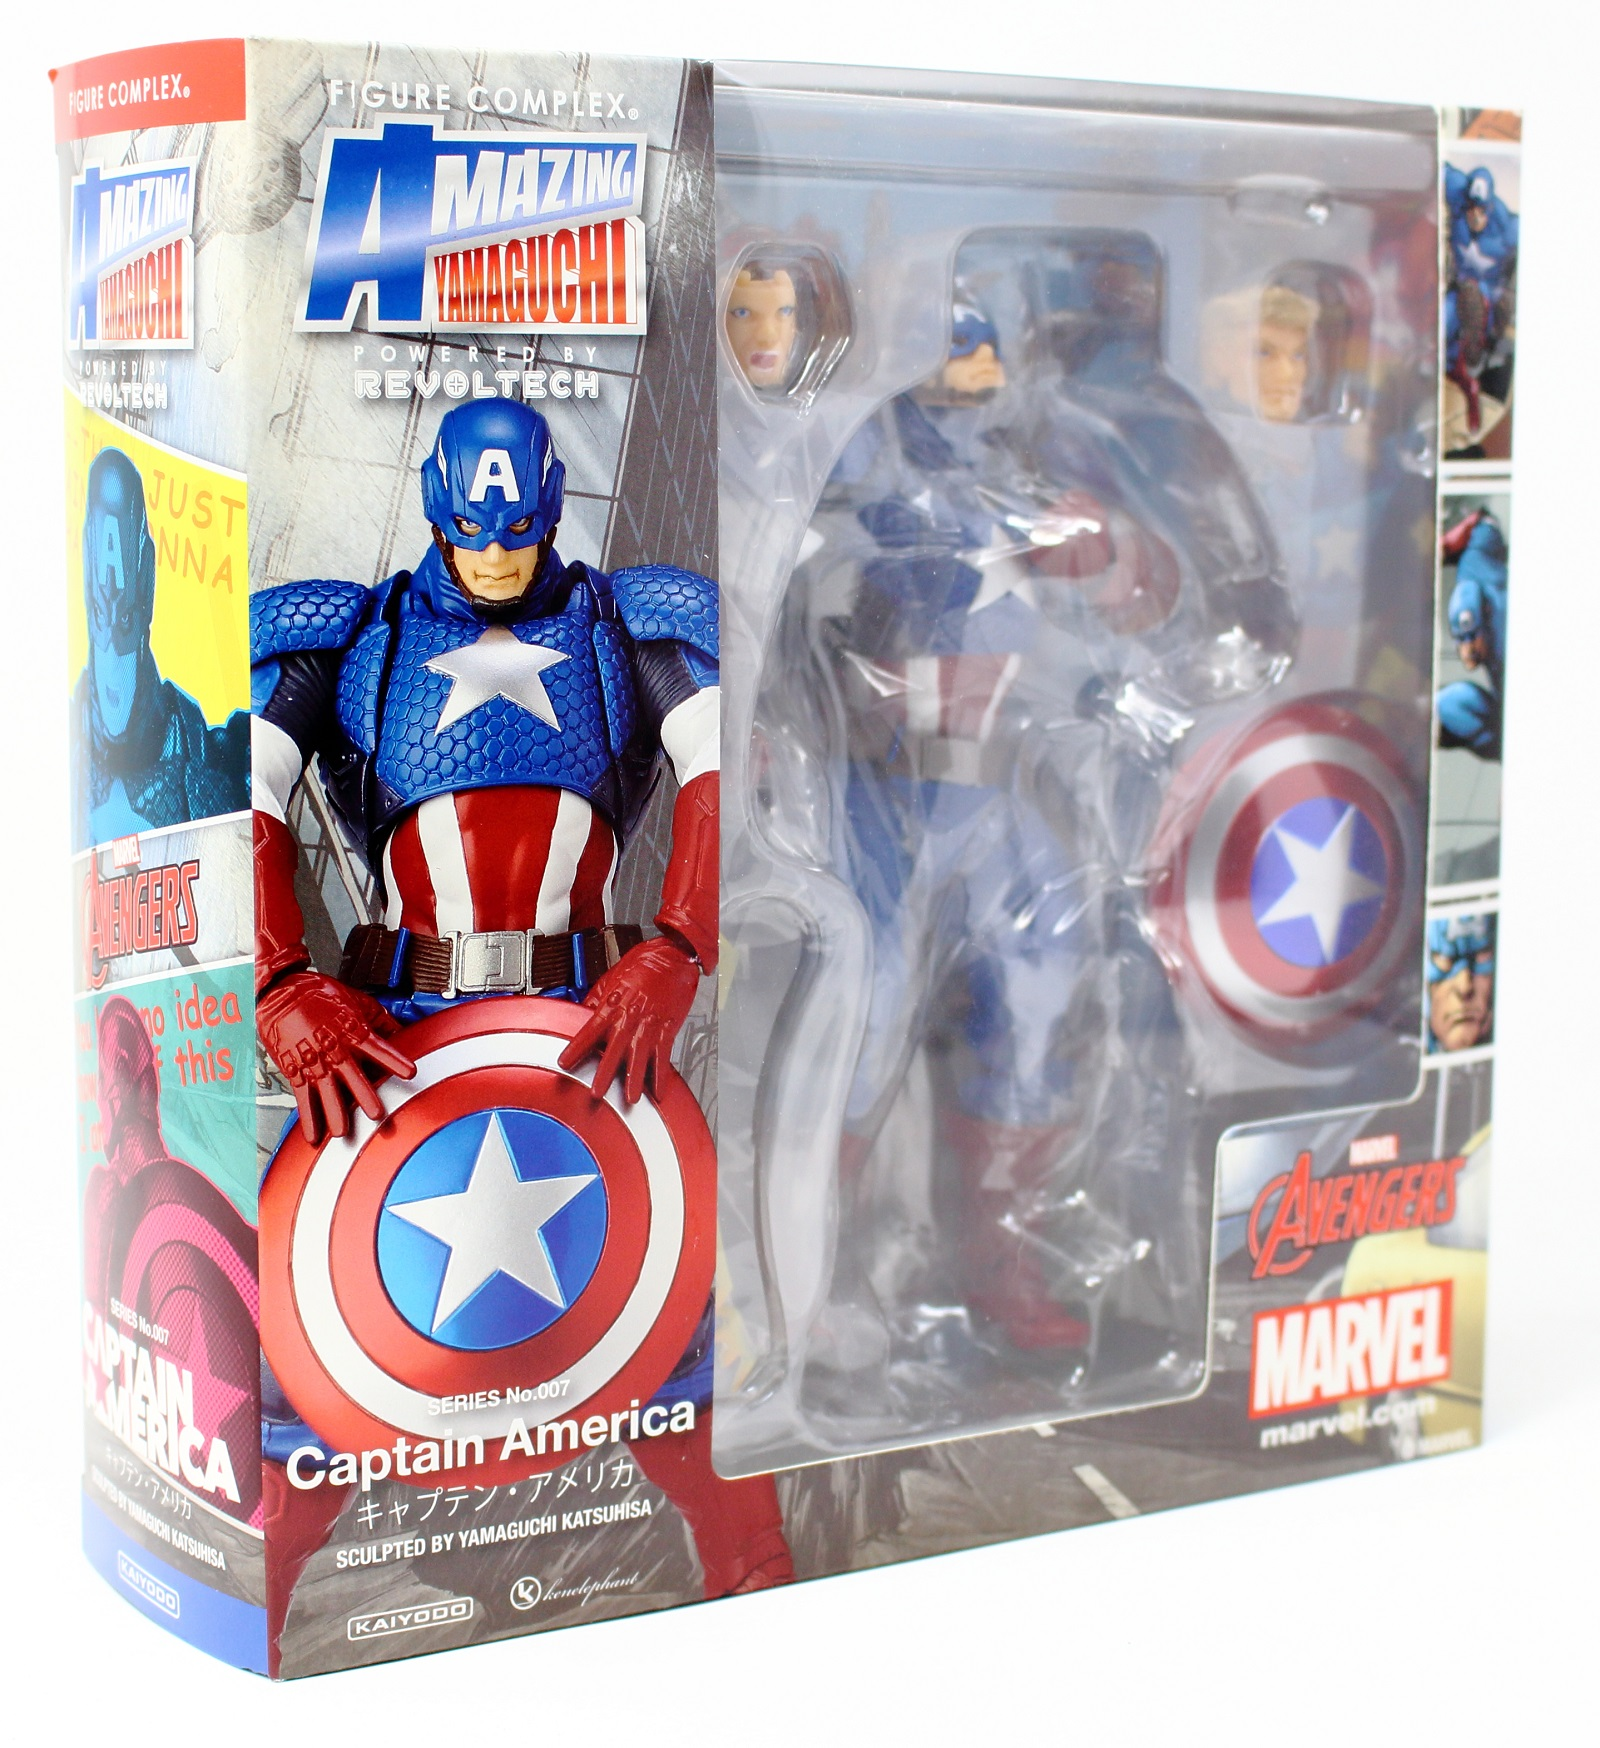 New US Revoltech No 007 Captain America Amazing Yamaguchi Marvel Avengers